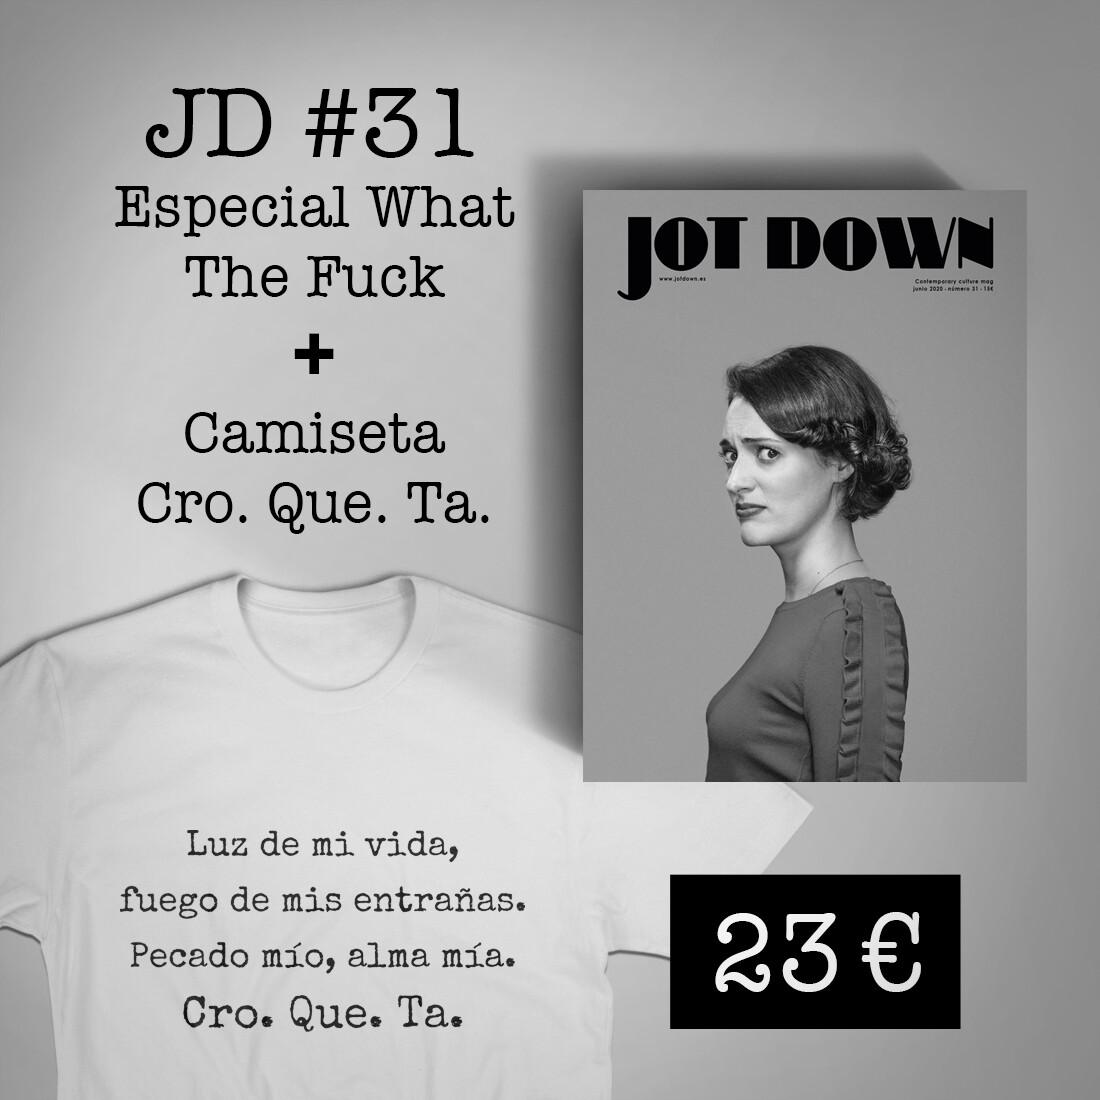 Jot Down nº 31 «WTF» + Camiseta «Cro.Que.Ta.»